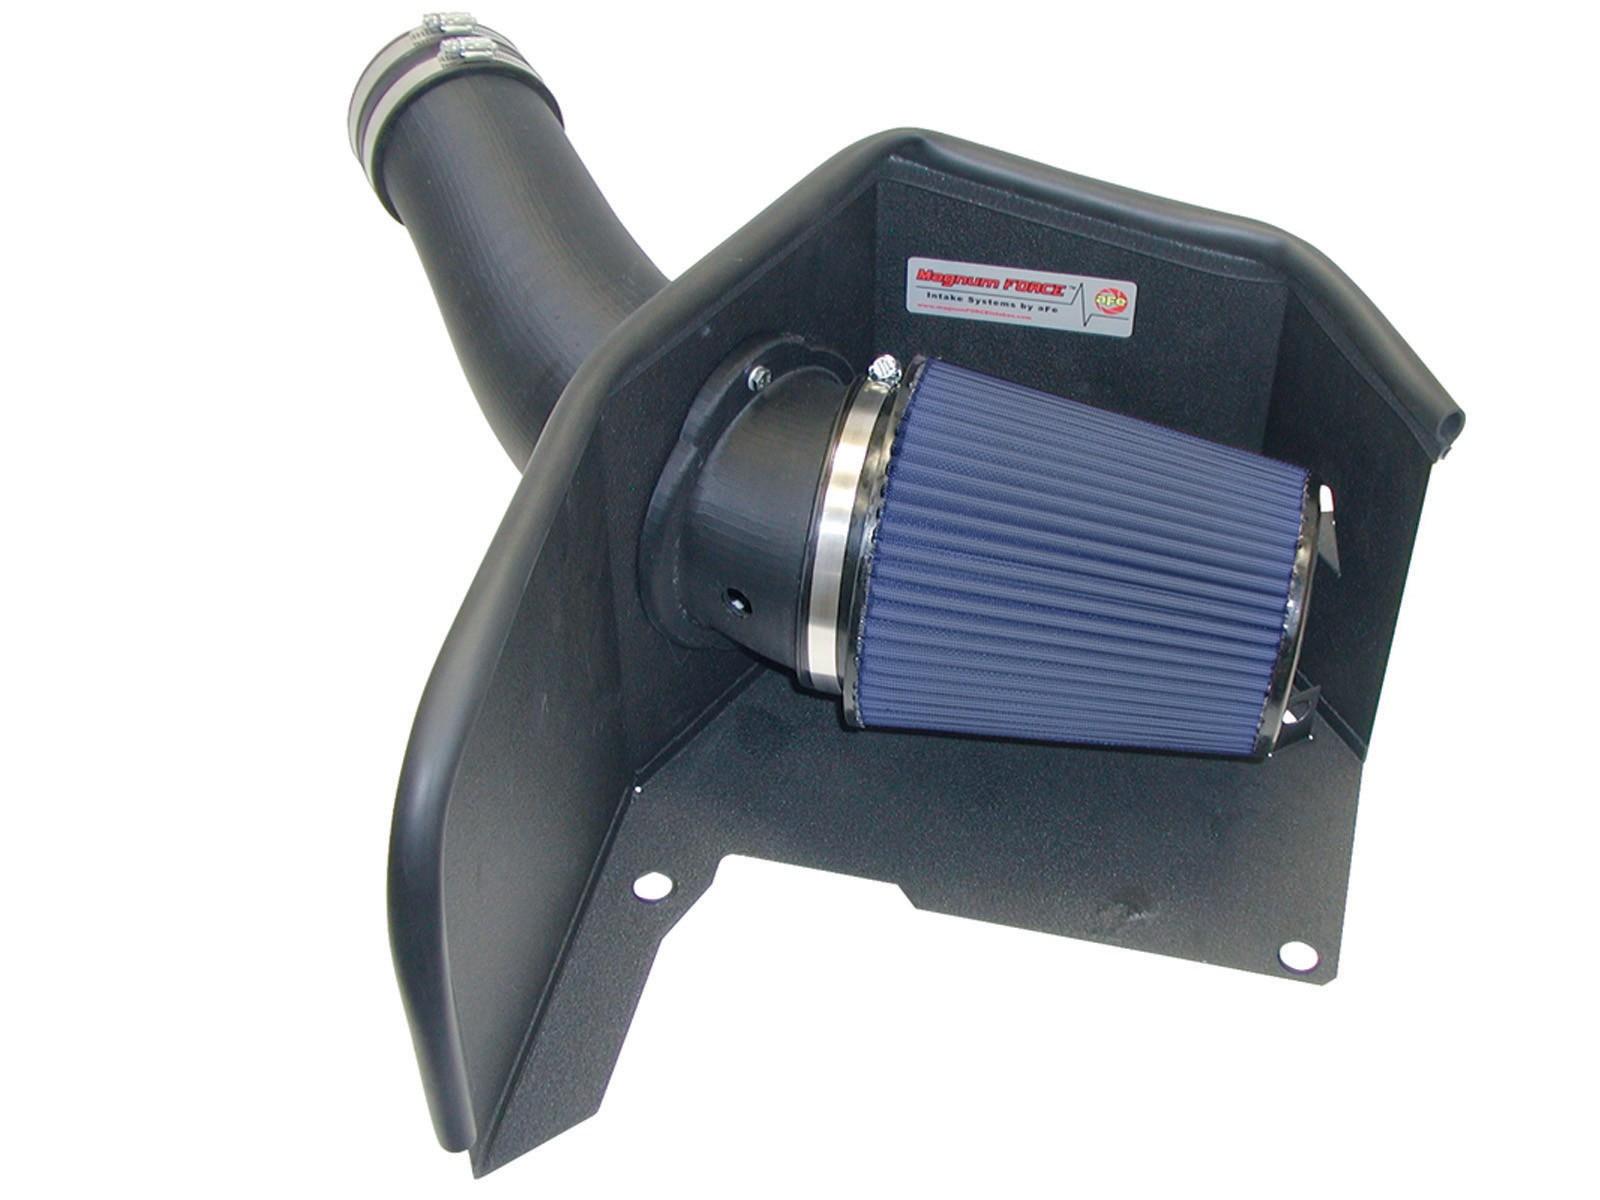 Cold Air Intake Heatshield for Ford 99-03 F-Series Super Duty Excursion V10 6.8L